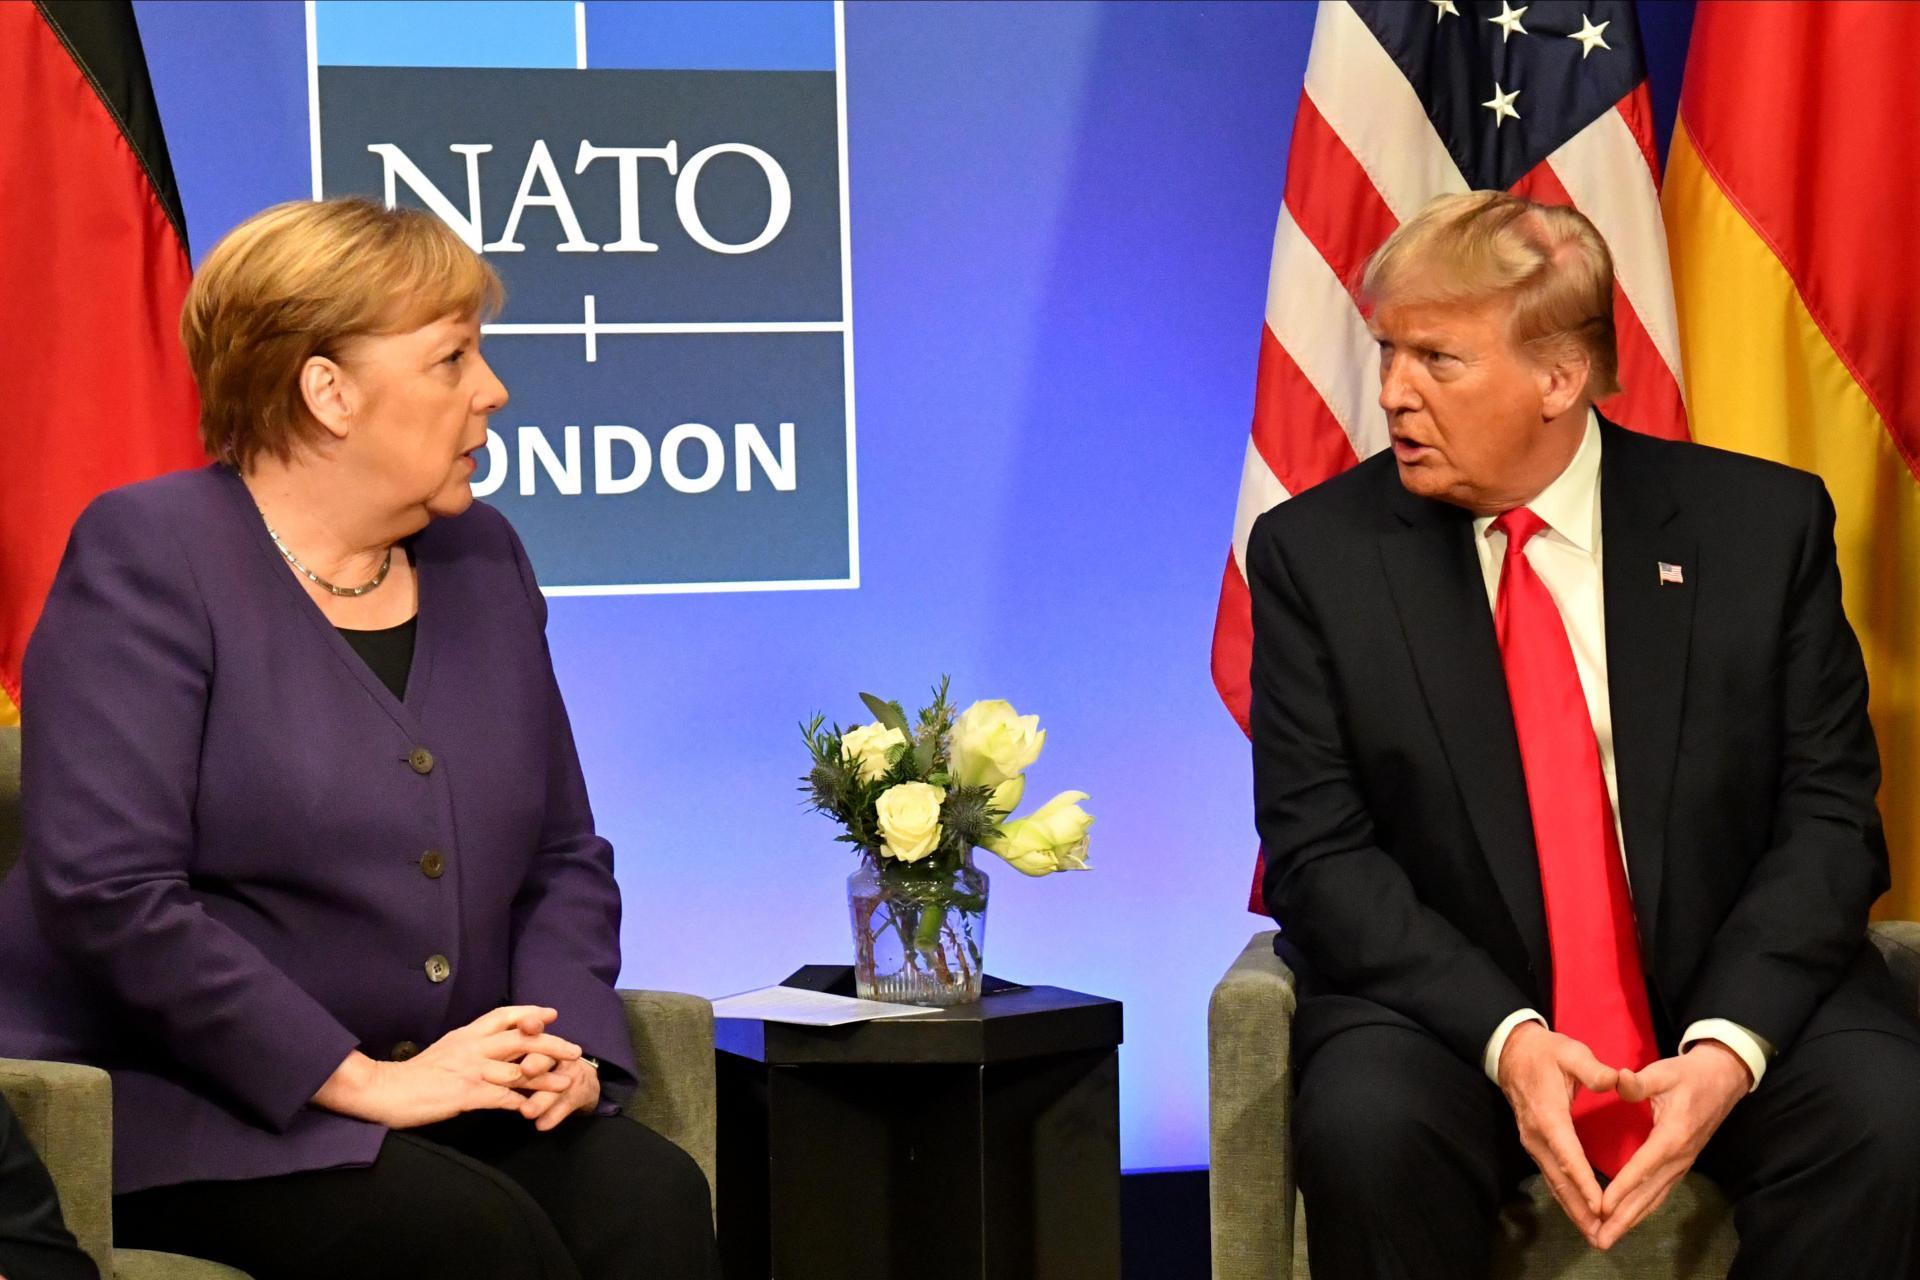 Angela Merkel and Donald Trump at a NATO Summit in 2019. Photo: AFP